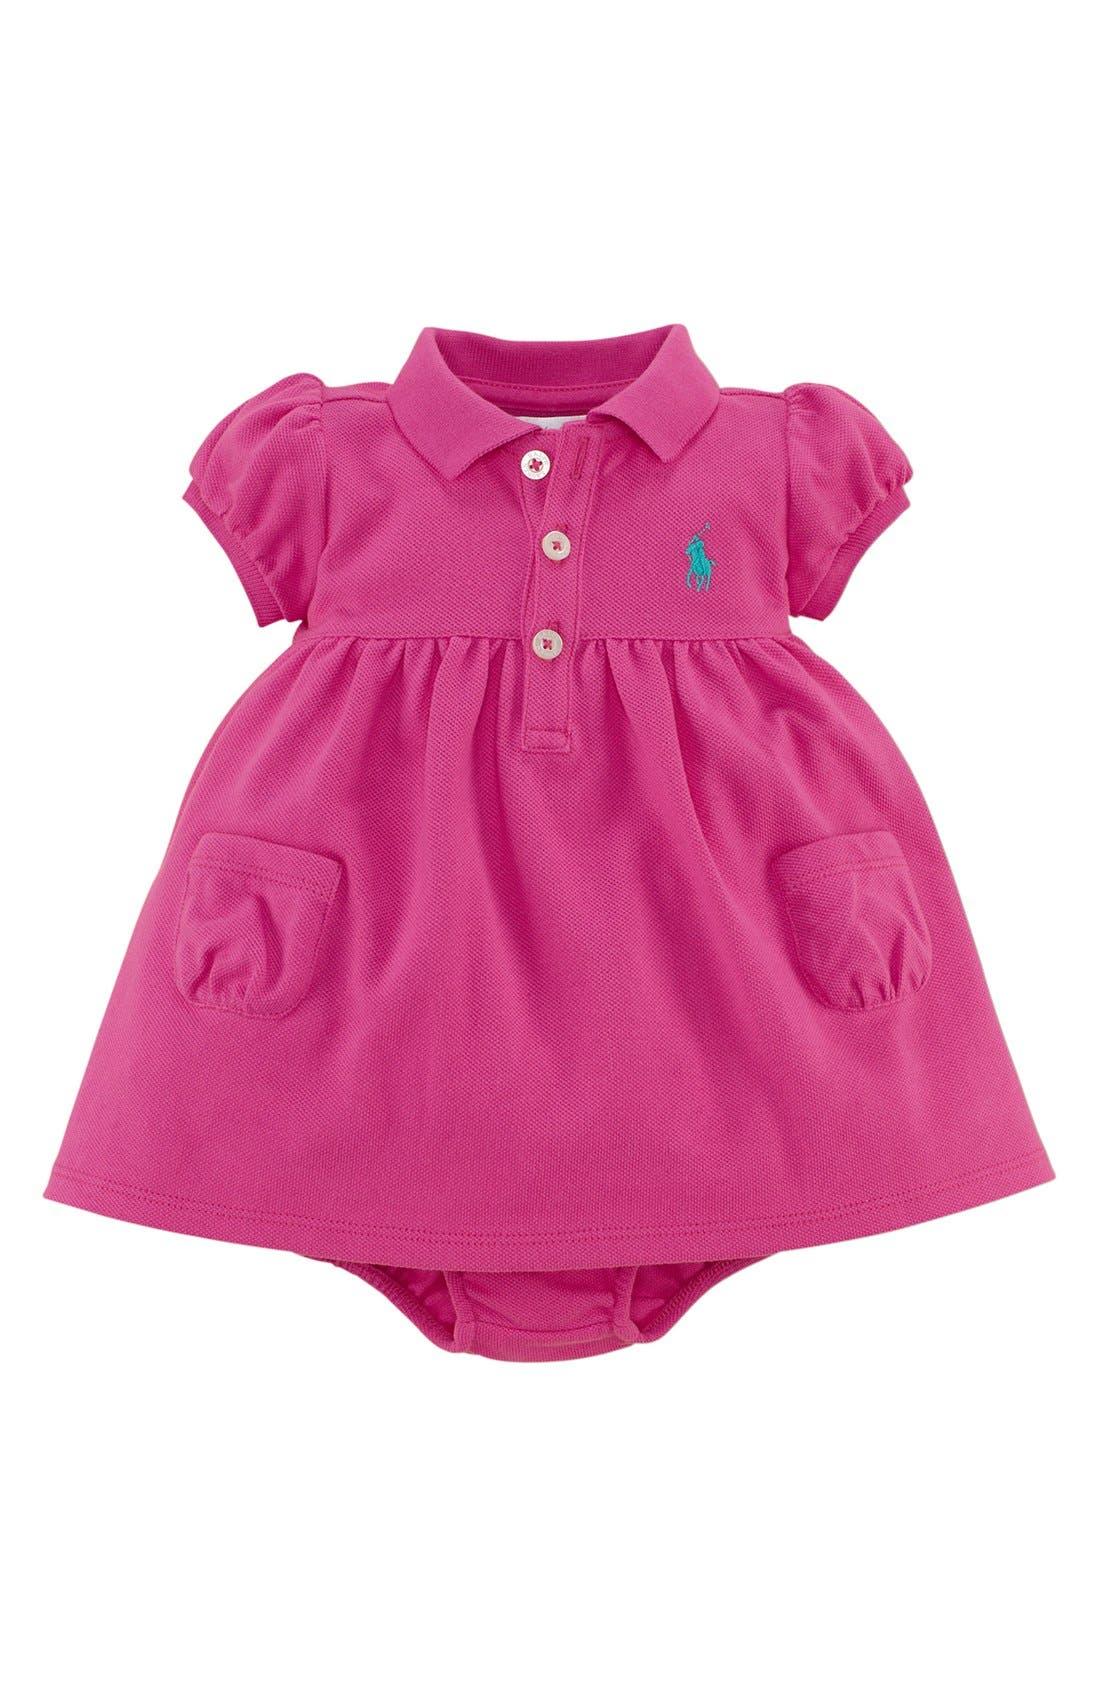 Main Image - Ralph Lauren Cotton Polo Dress & Bloomers (Baby Girls)